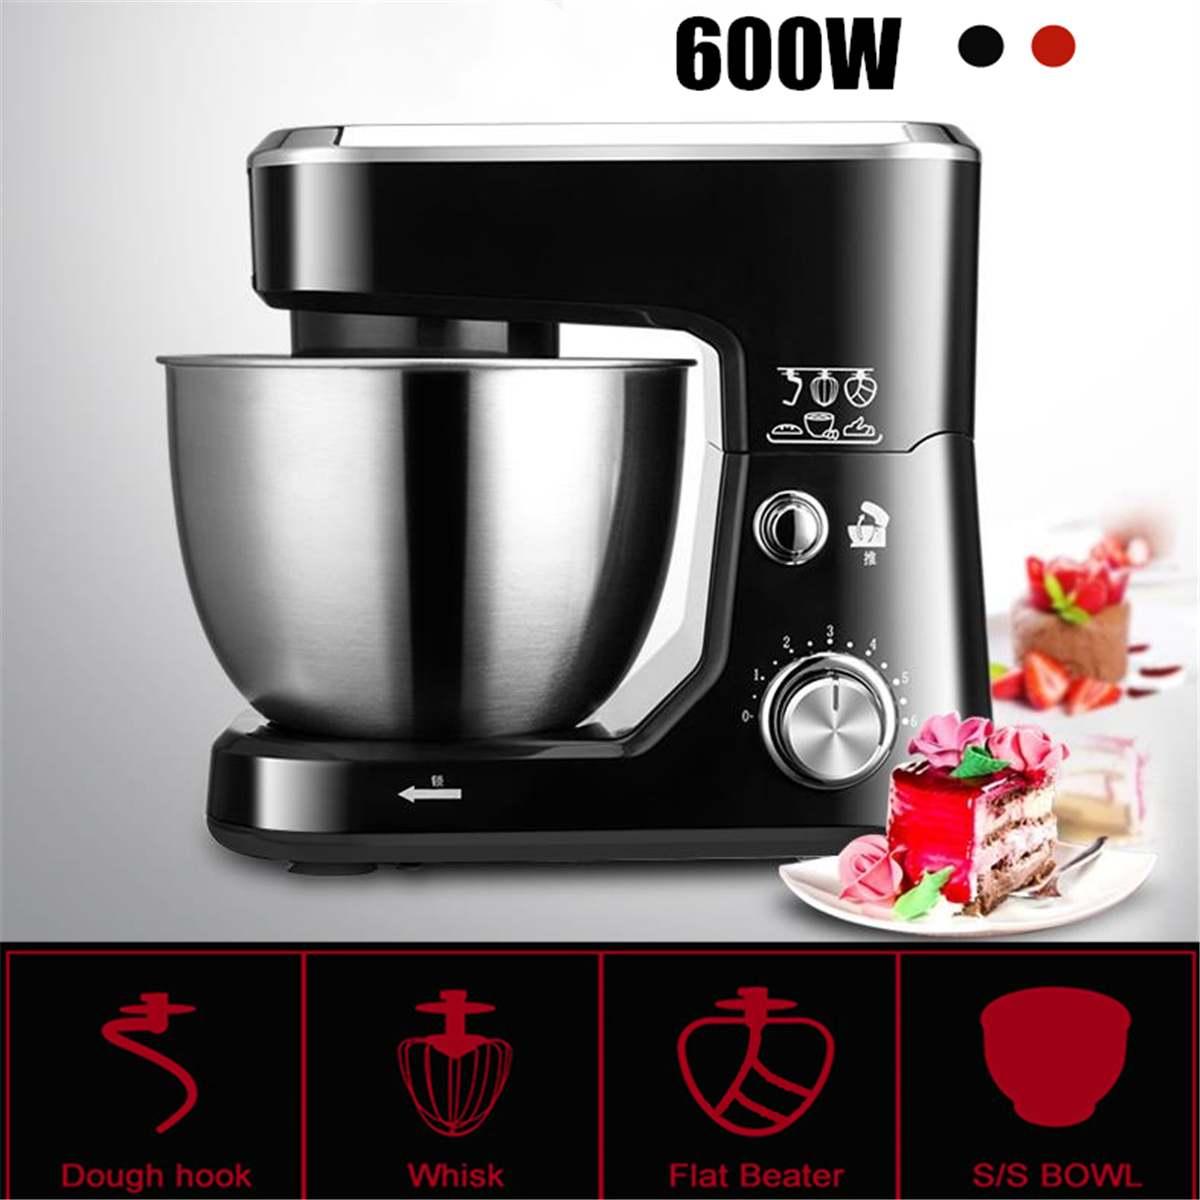 1200W Bowl lift Stand Mixer 4L Kitchen Stand High Power Food PMilkshake/Cake Dough Kneading Machine Blenders Home Smoothie Maker